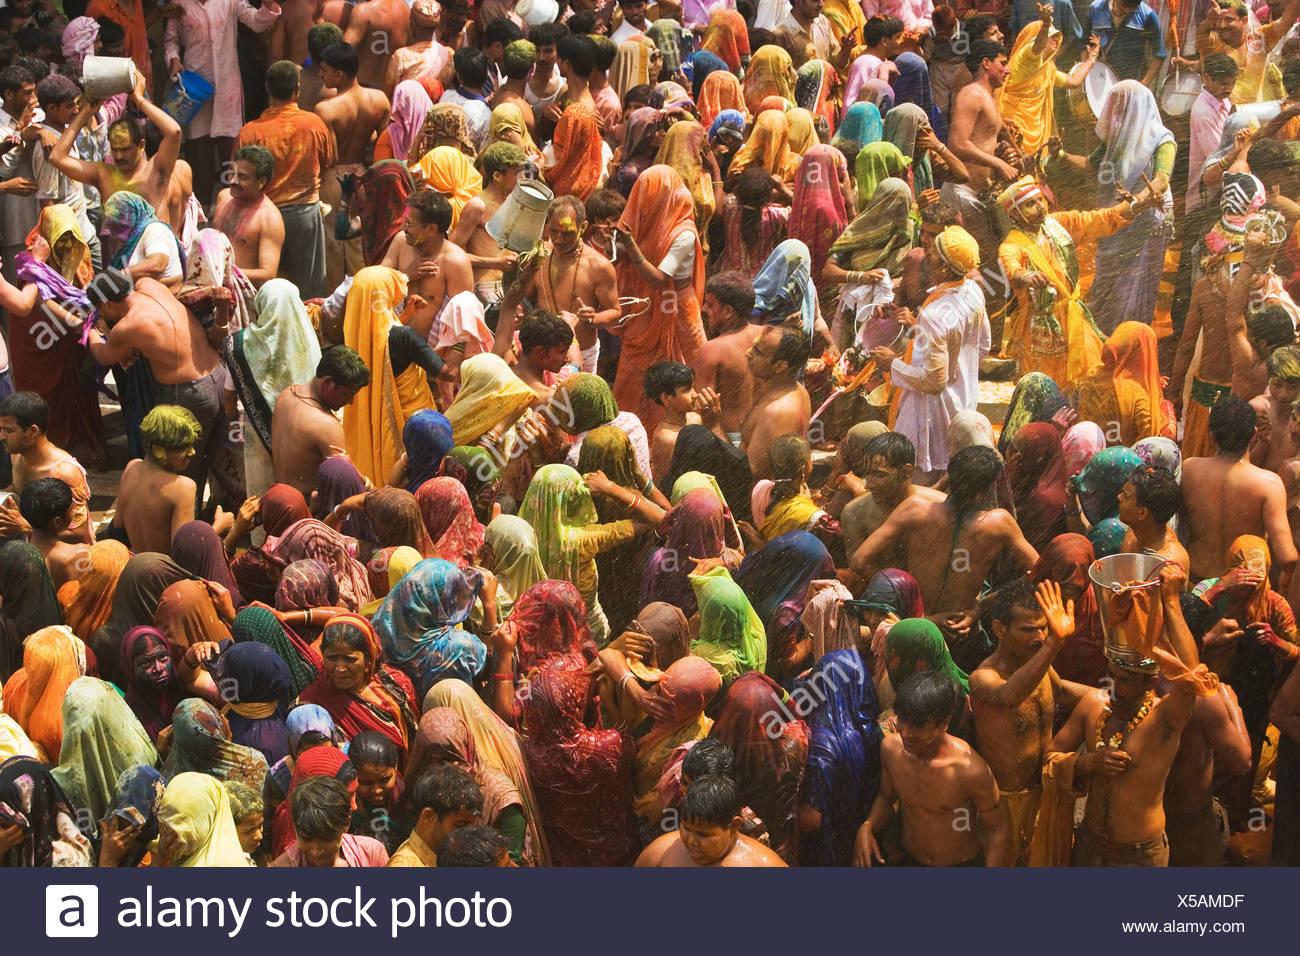 A colorful crowd of people celebrate the Holi Festival, Mathura, Uttar Pradesh, India - Stock Image